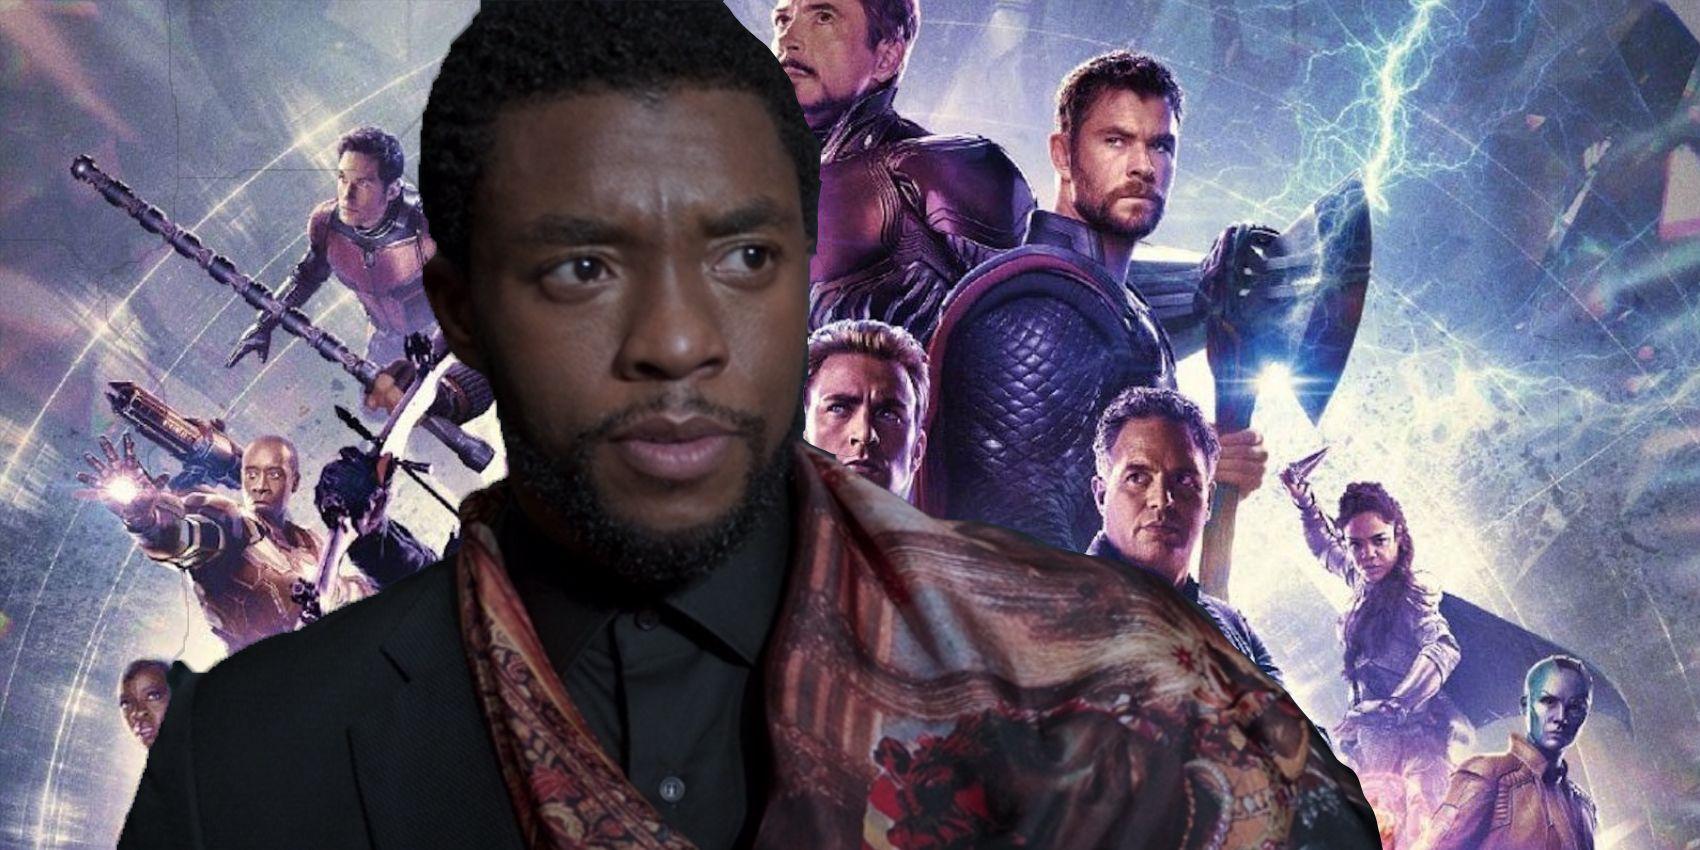 Mcu 5 Inspirational Black Panther Scenes 5 Fans Felt Sorry For Him